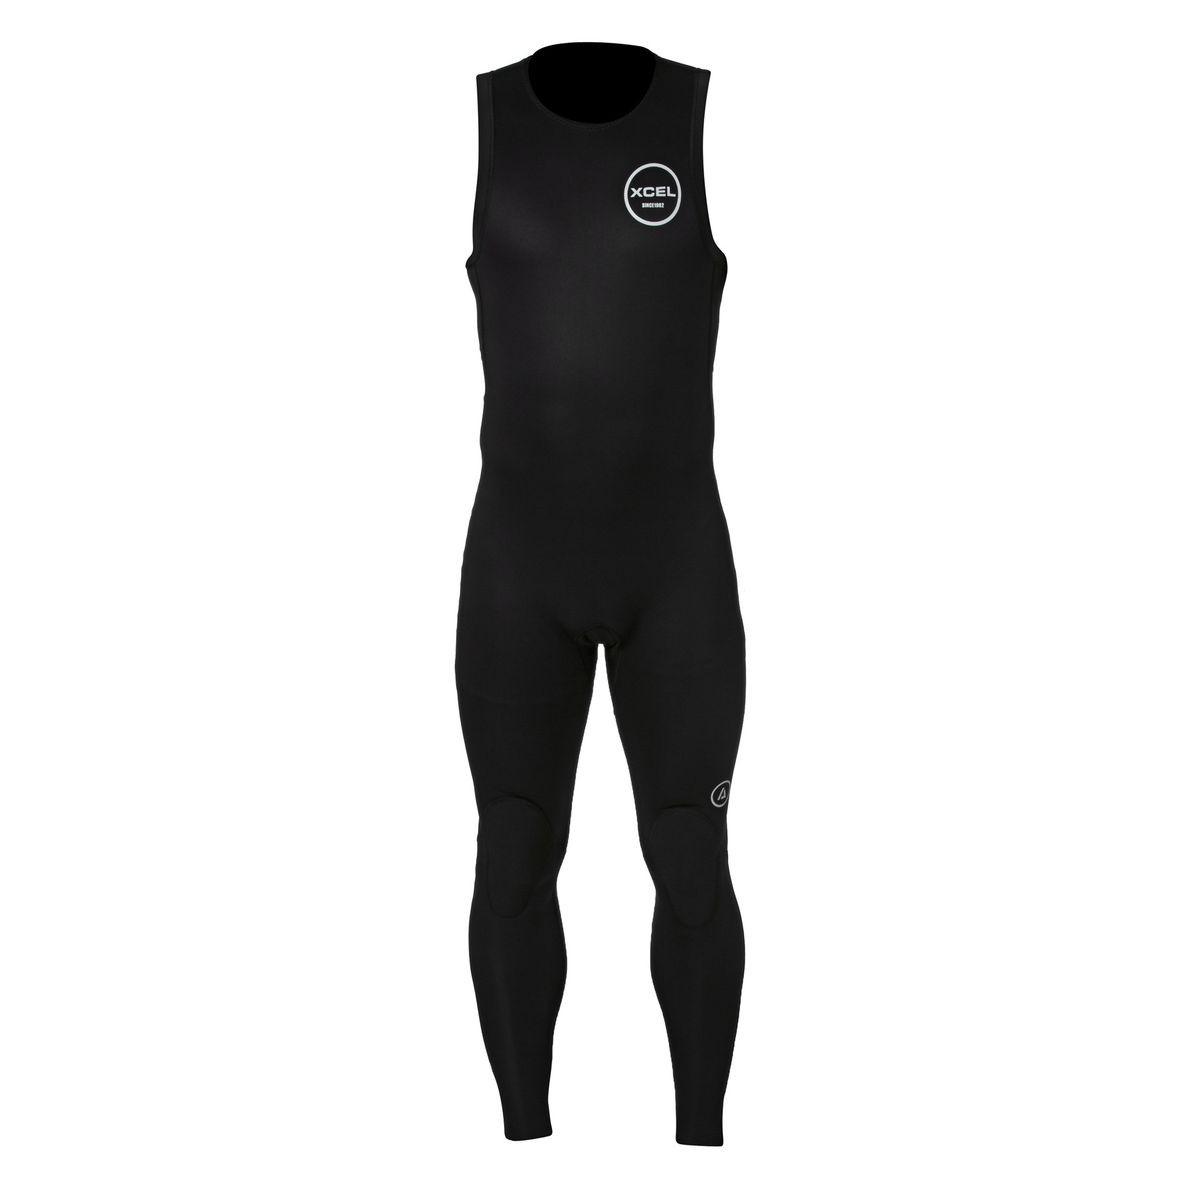 Xcel Axis 2mm Back Zip Long John Wetsuit - Black